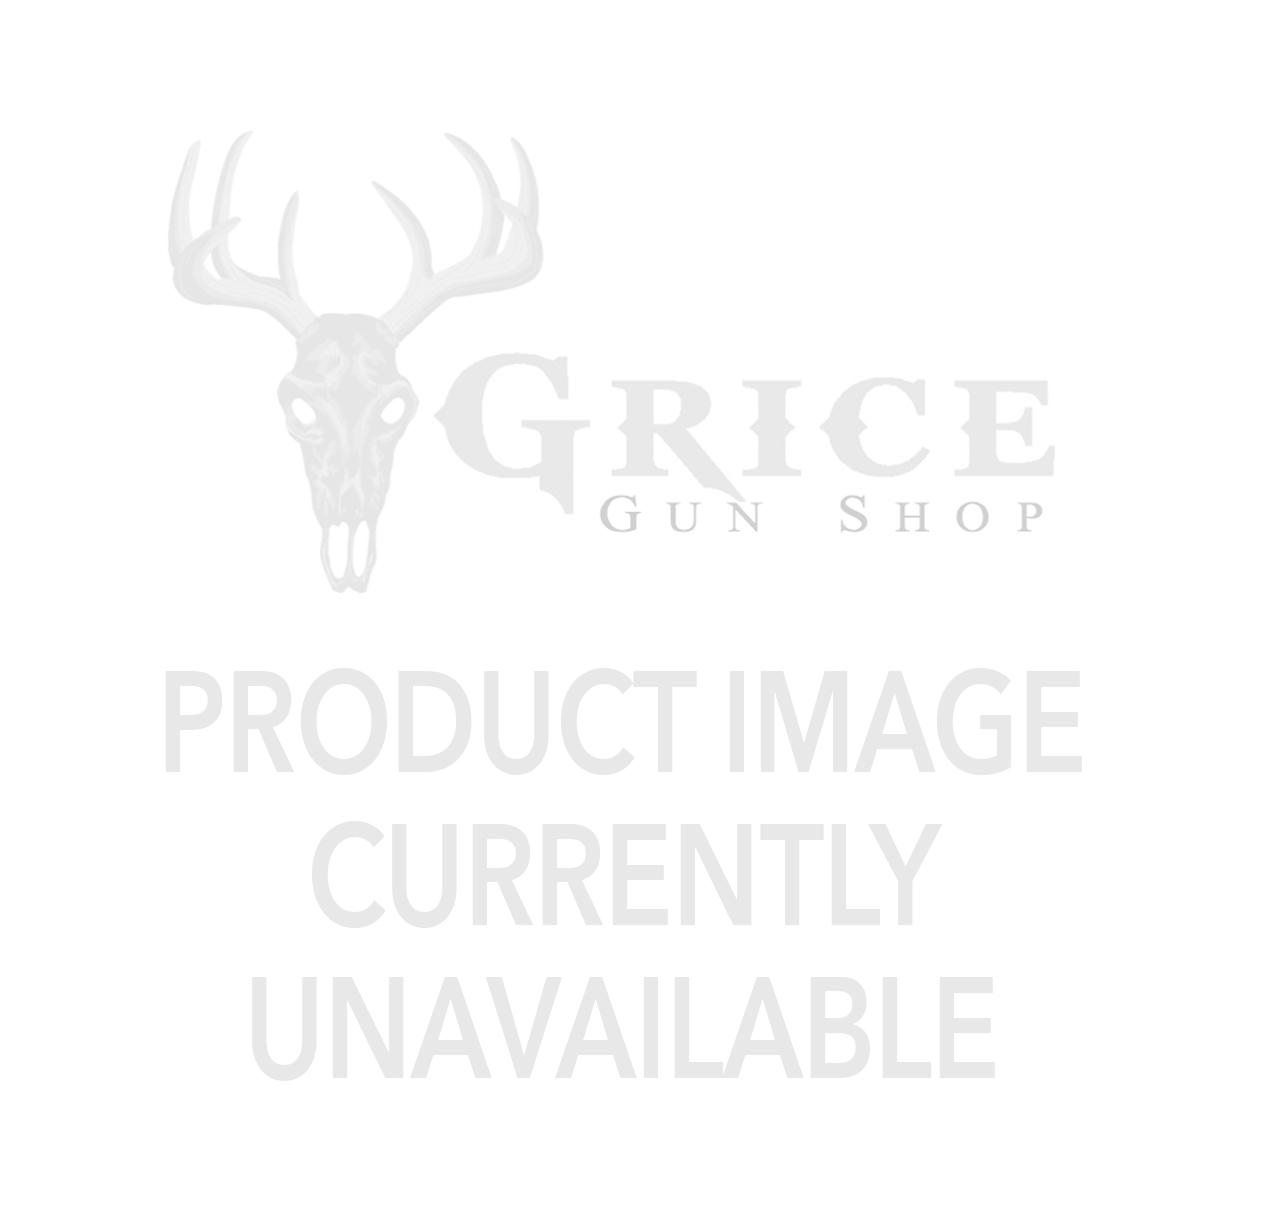 Hornady Case 7mm STW Unprimed